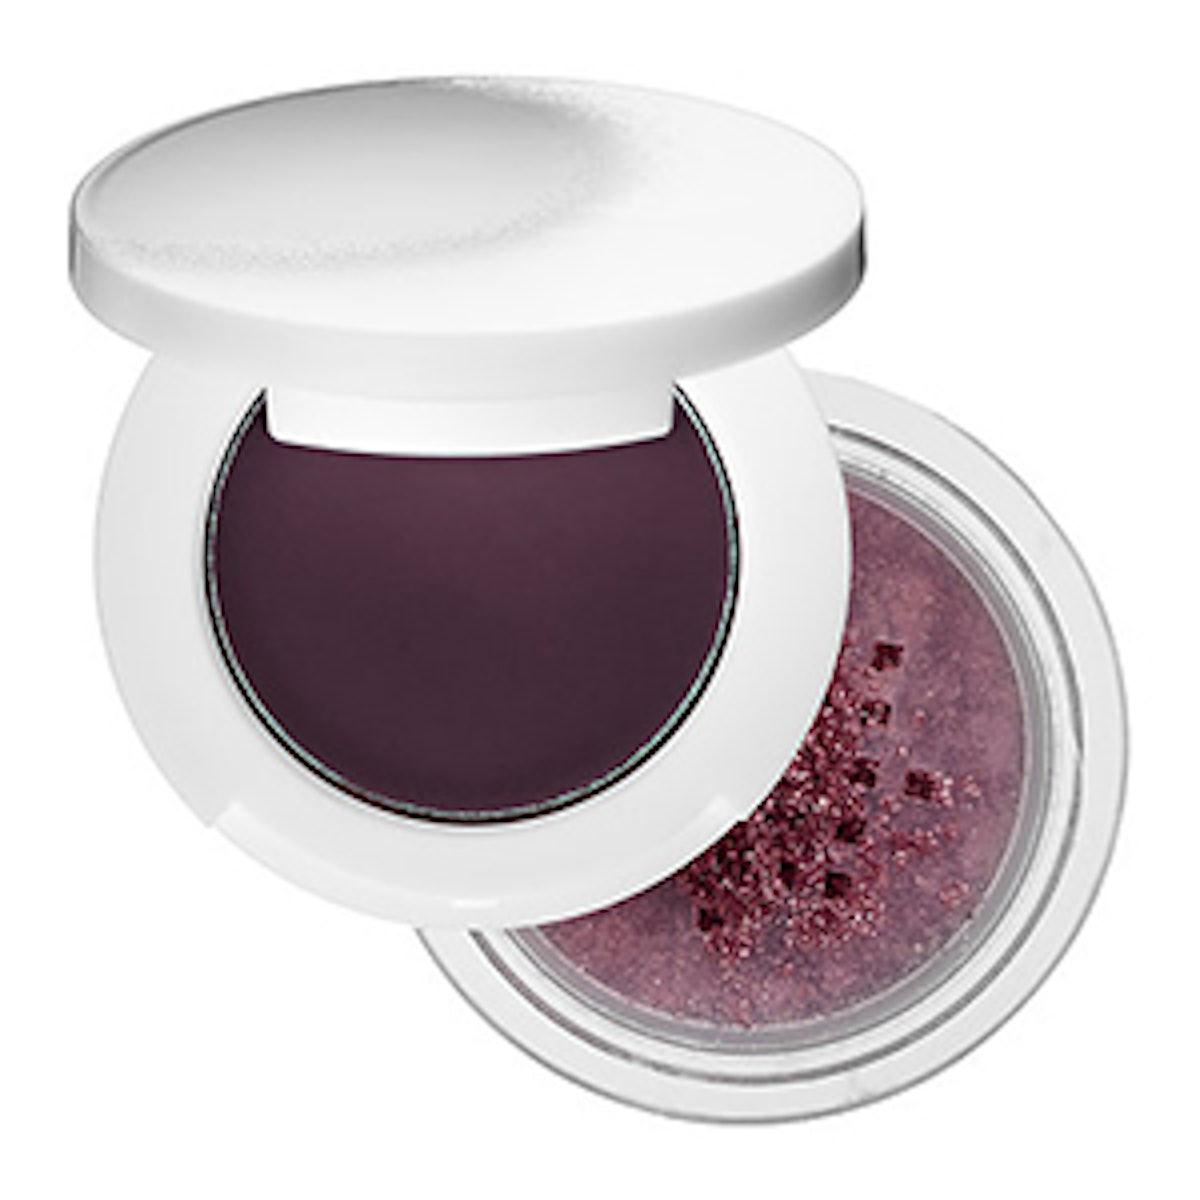 The Estée Edit by Estée Lauder Metallishadow Creme + Powder in Cyberella